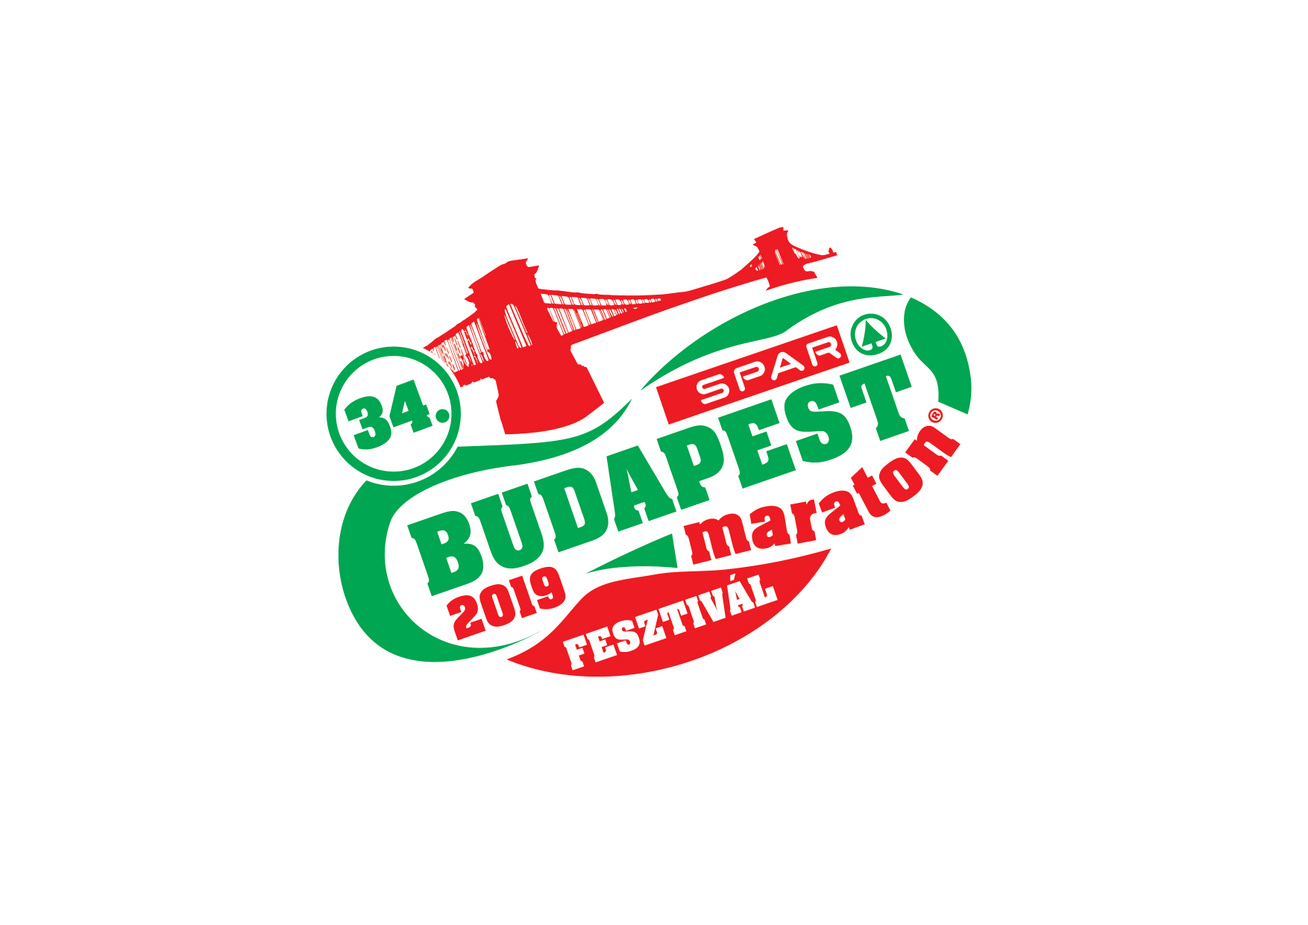 SPAR Budapest Maraton Fesztival logo 2019